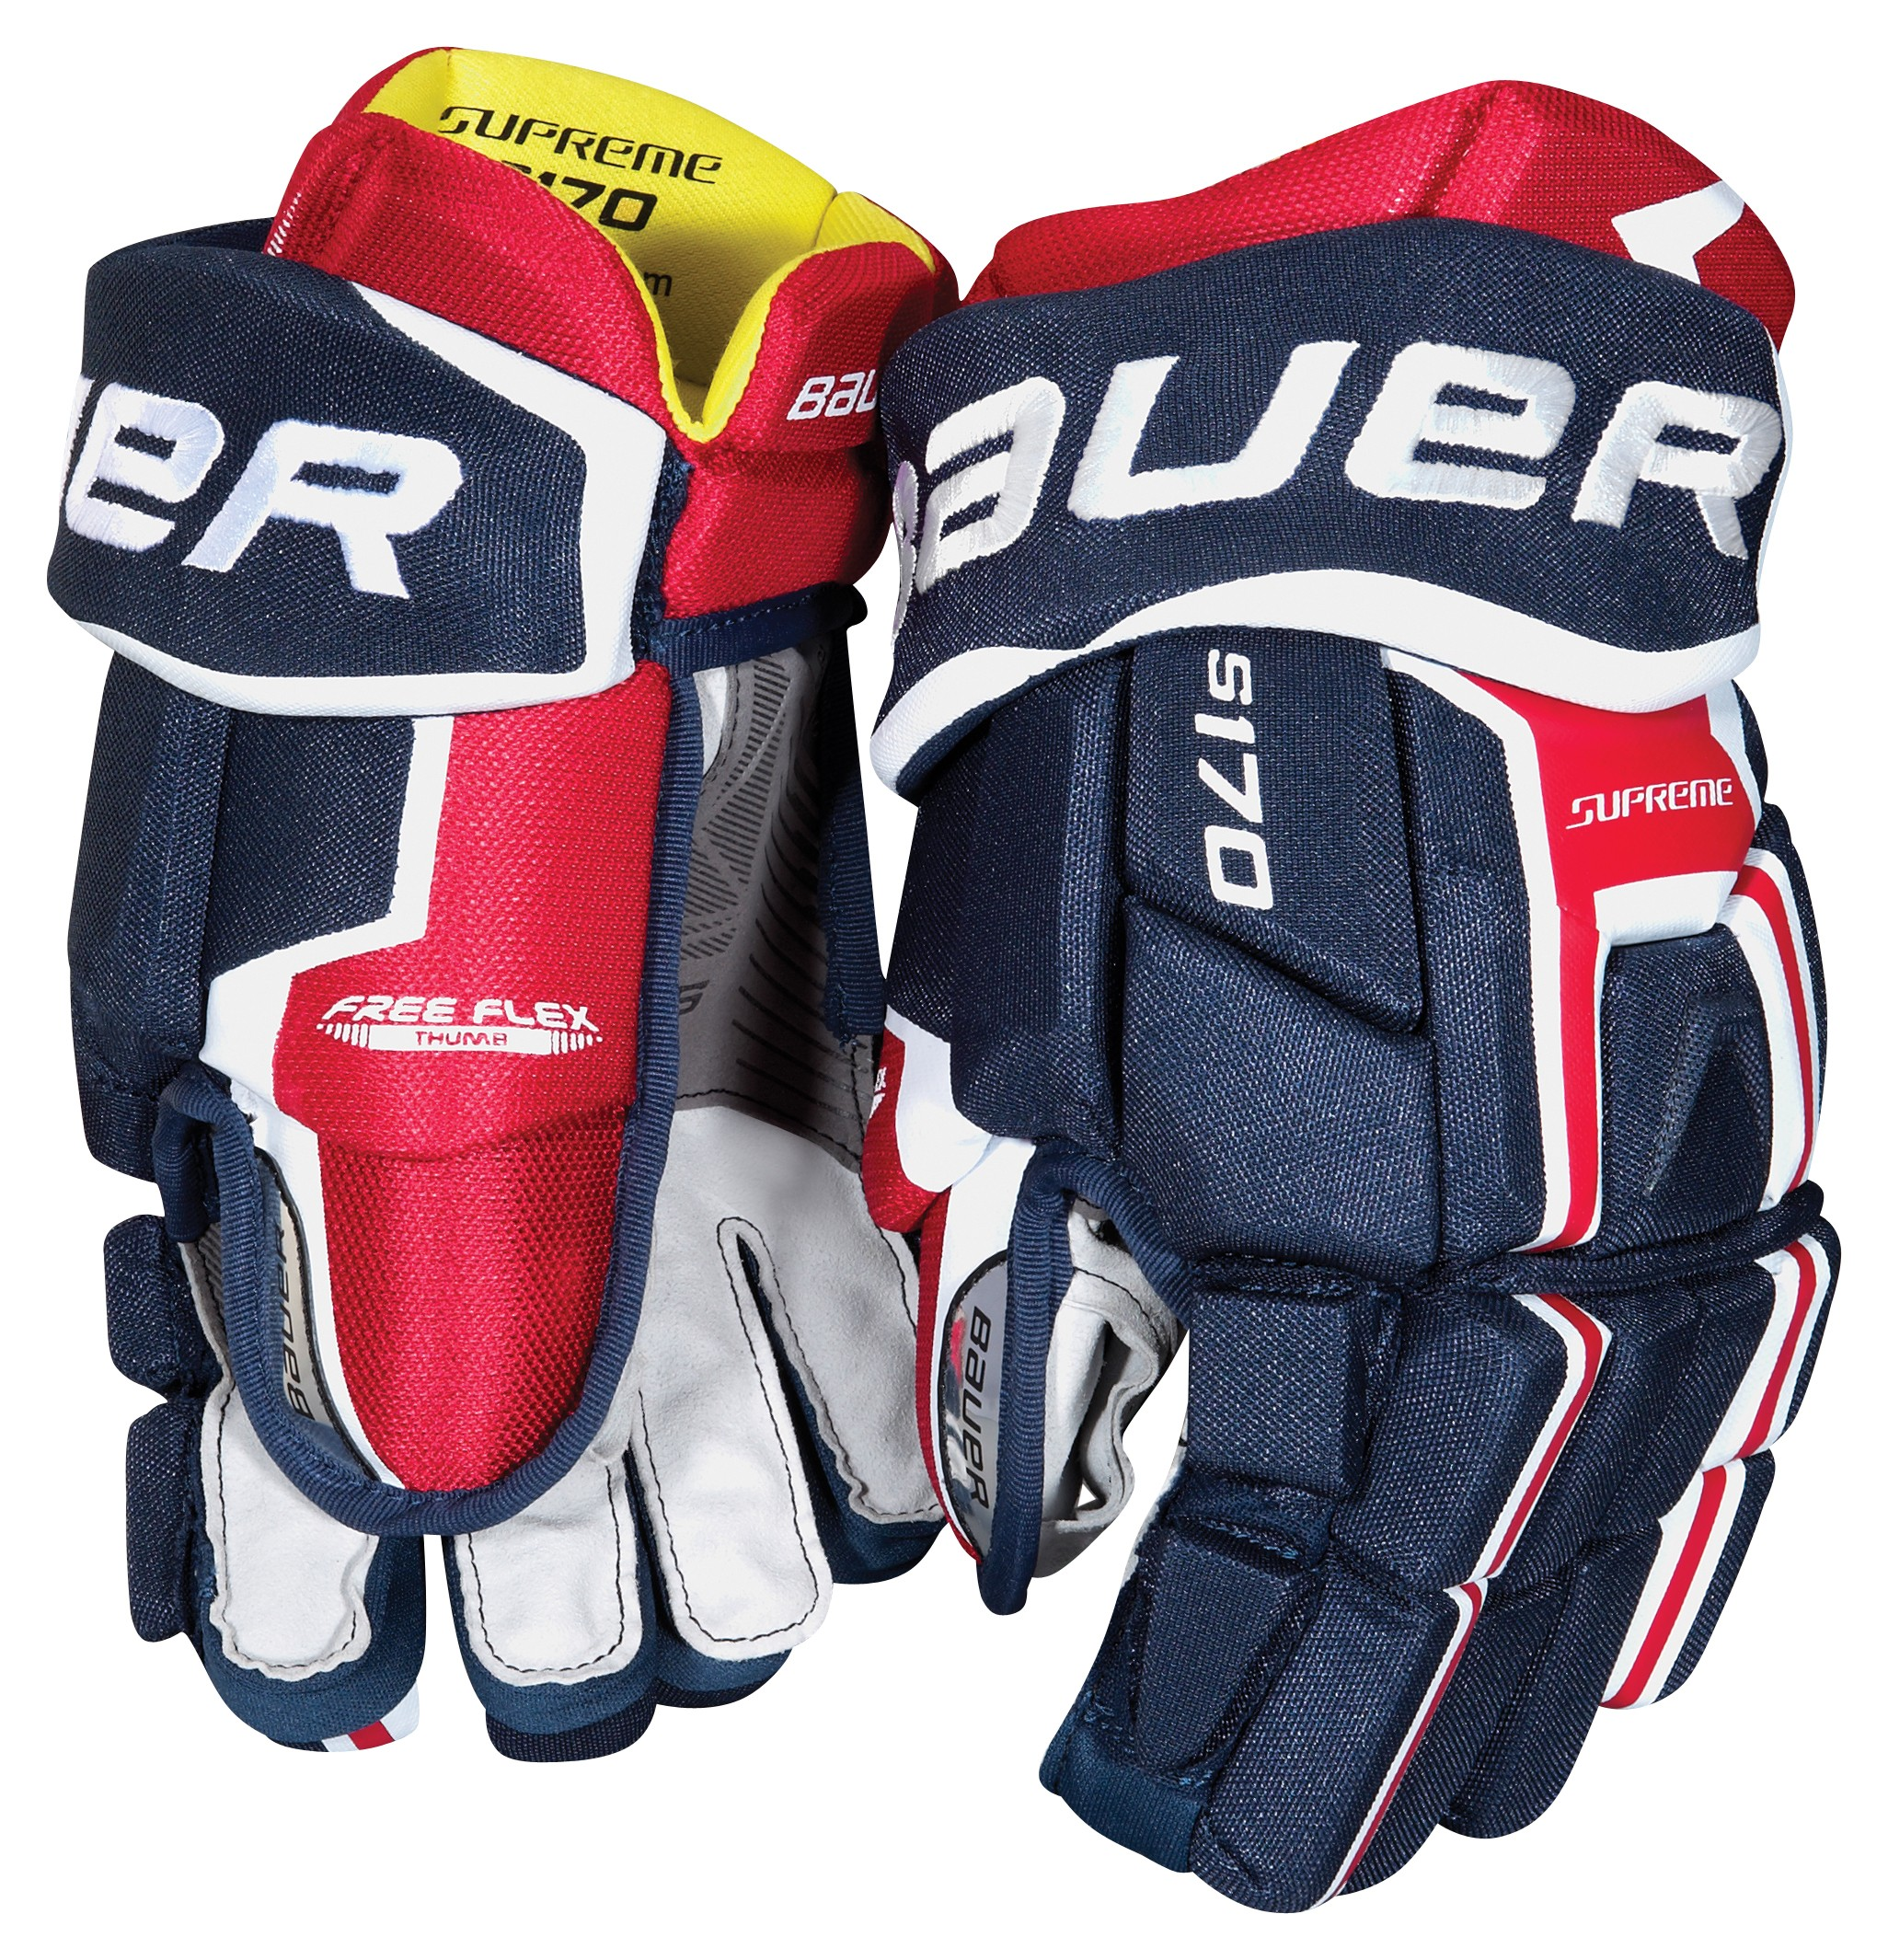 Hokejové rukavice BAUER SUPREME S170 senior  d83c0a958c